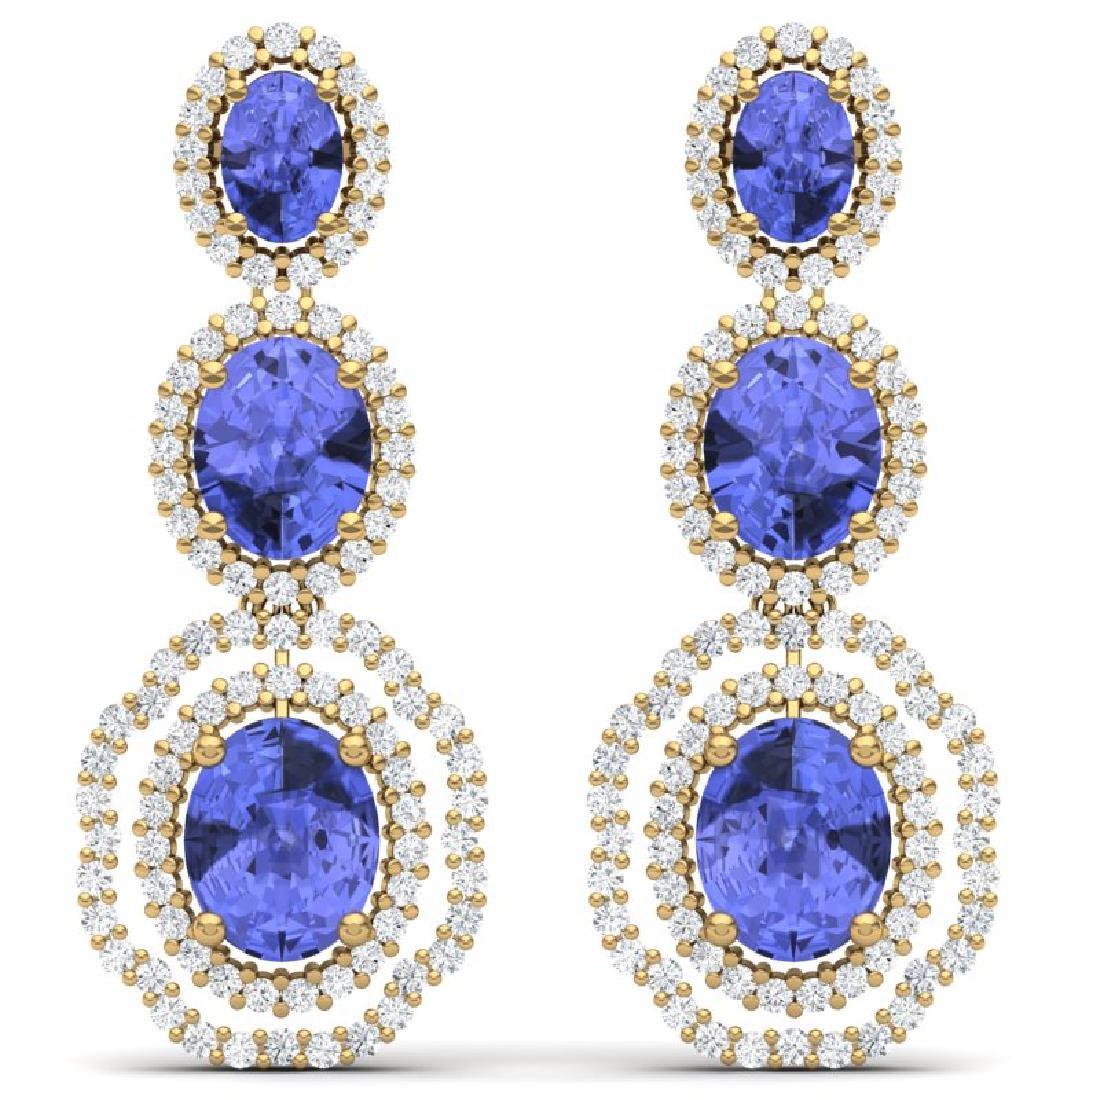 17.32 CTW Royalty Tanzanite & VS Diamond Earrings 18K